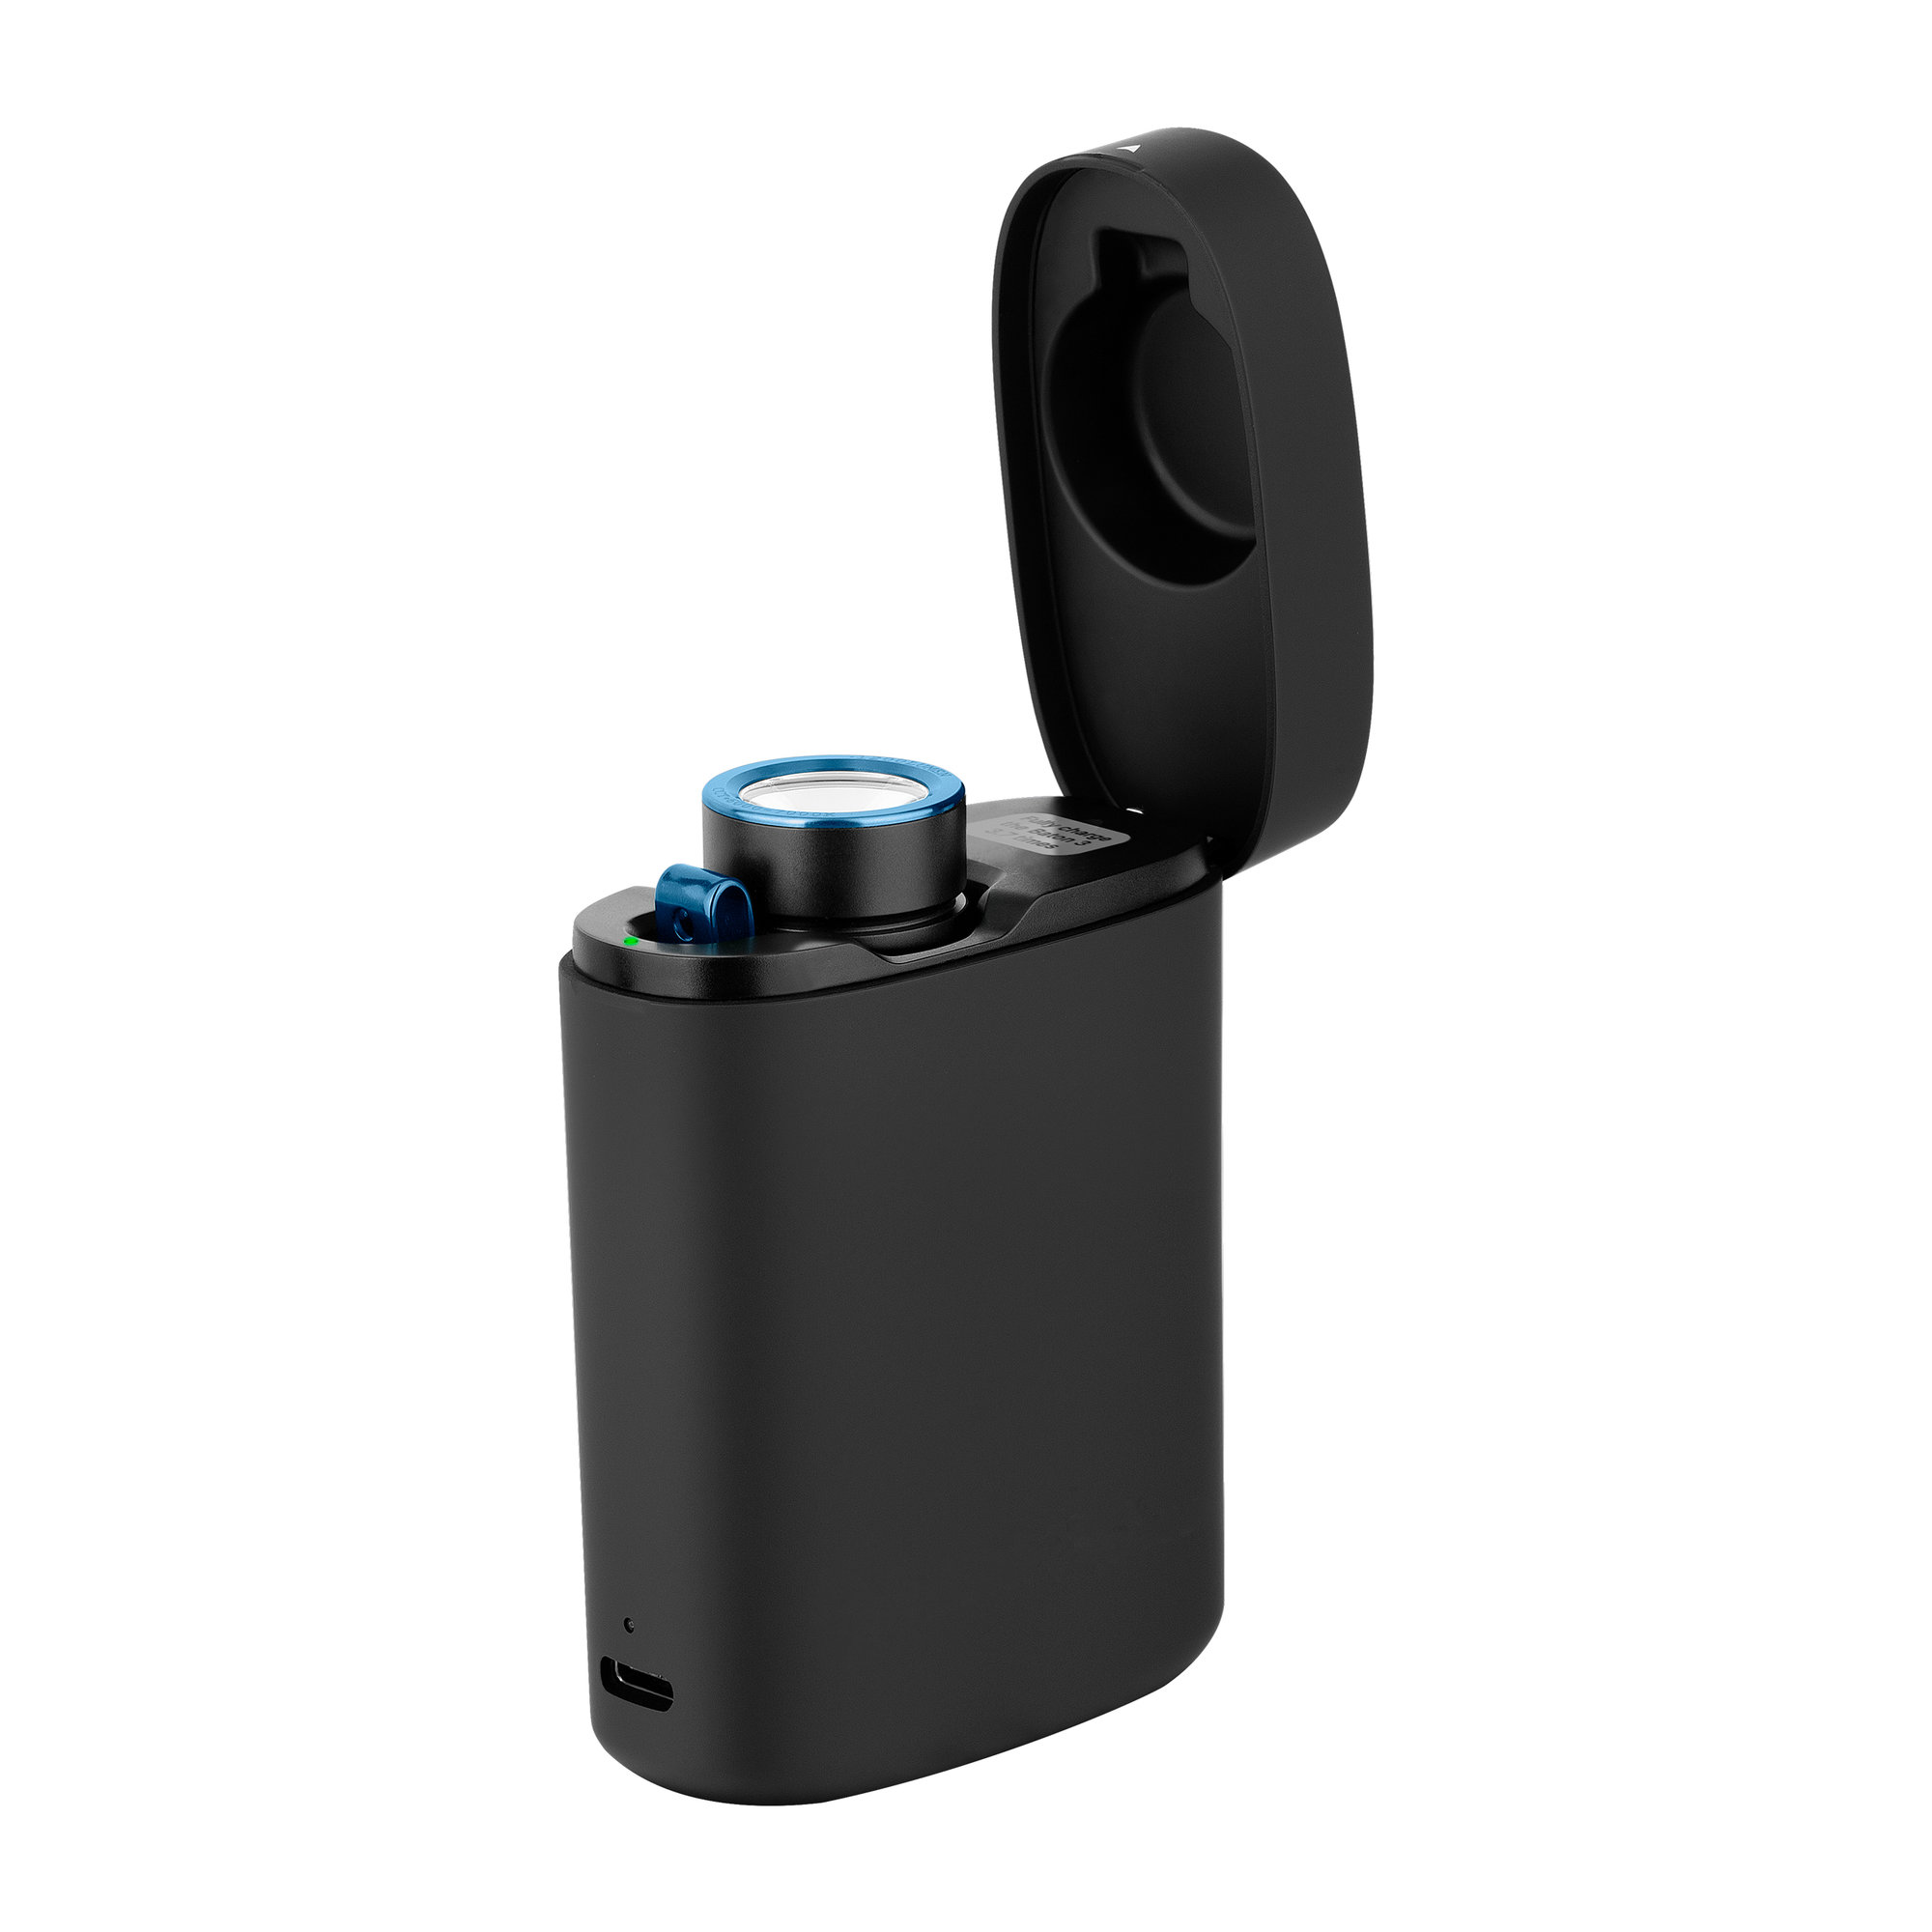 LED baterka Olight Baton 3 Black Premium Edition 1200 lm